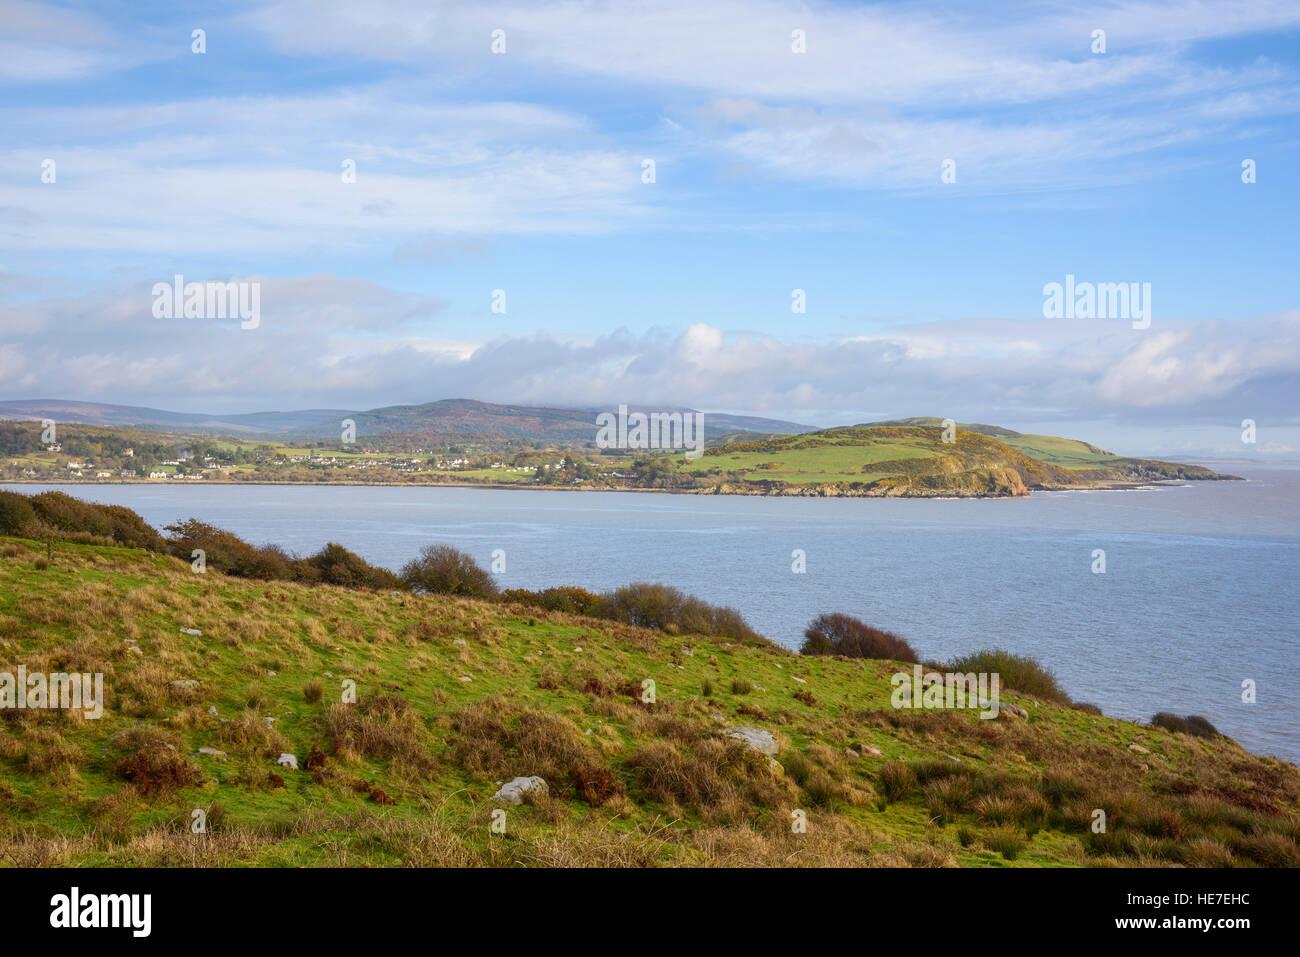 Firth irregolare dal punto Almorness, Solway Firth, Dumfries & Galloway, Scozia Immagini Stock